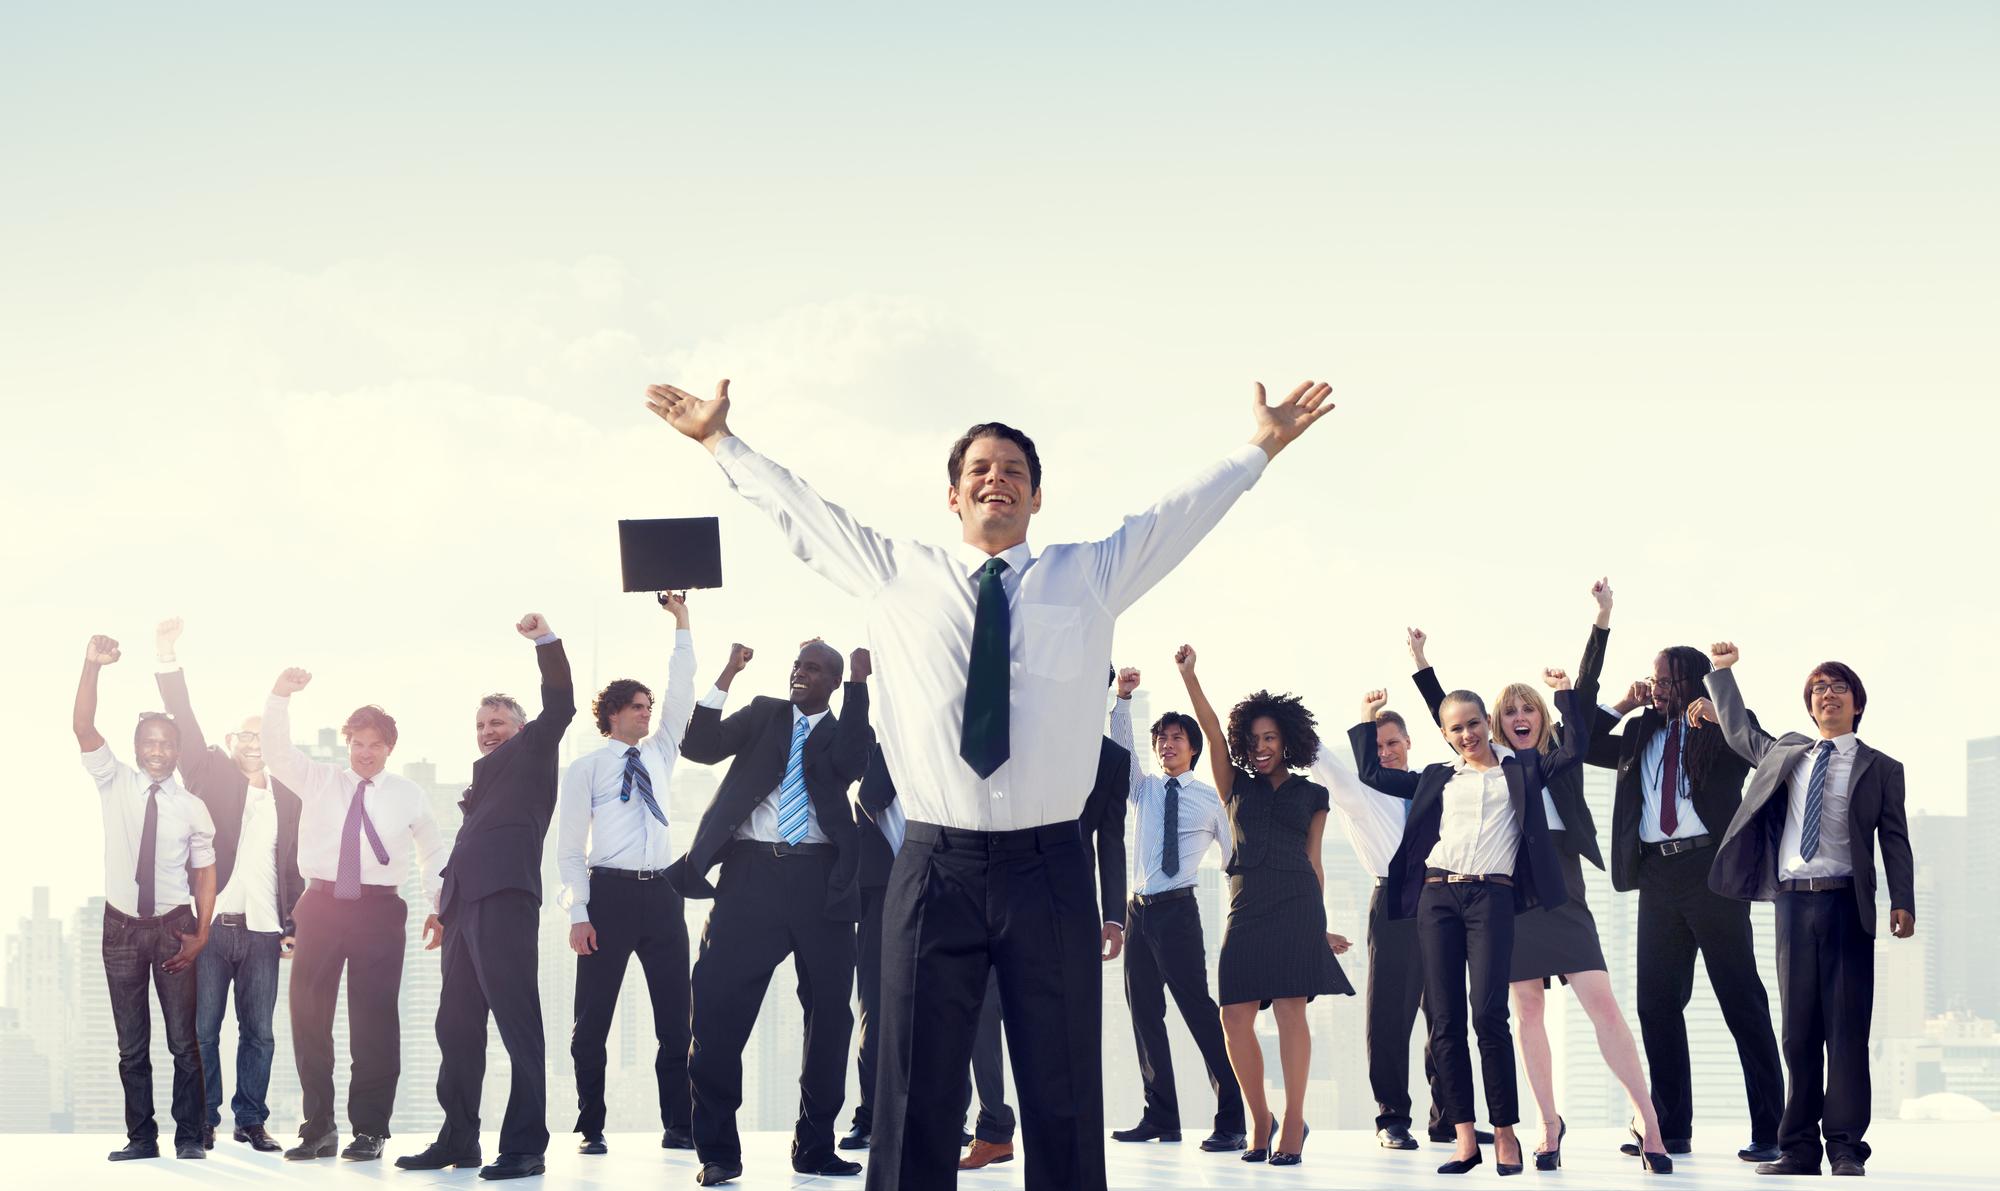 Business People Team Success Celebration Concept